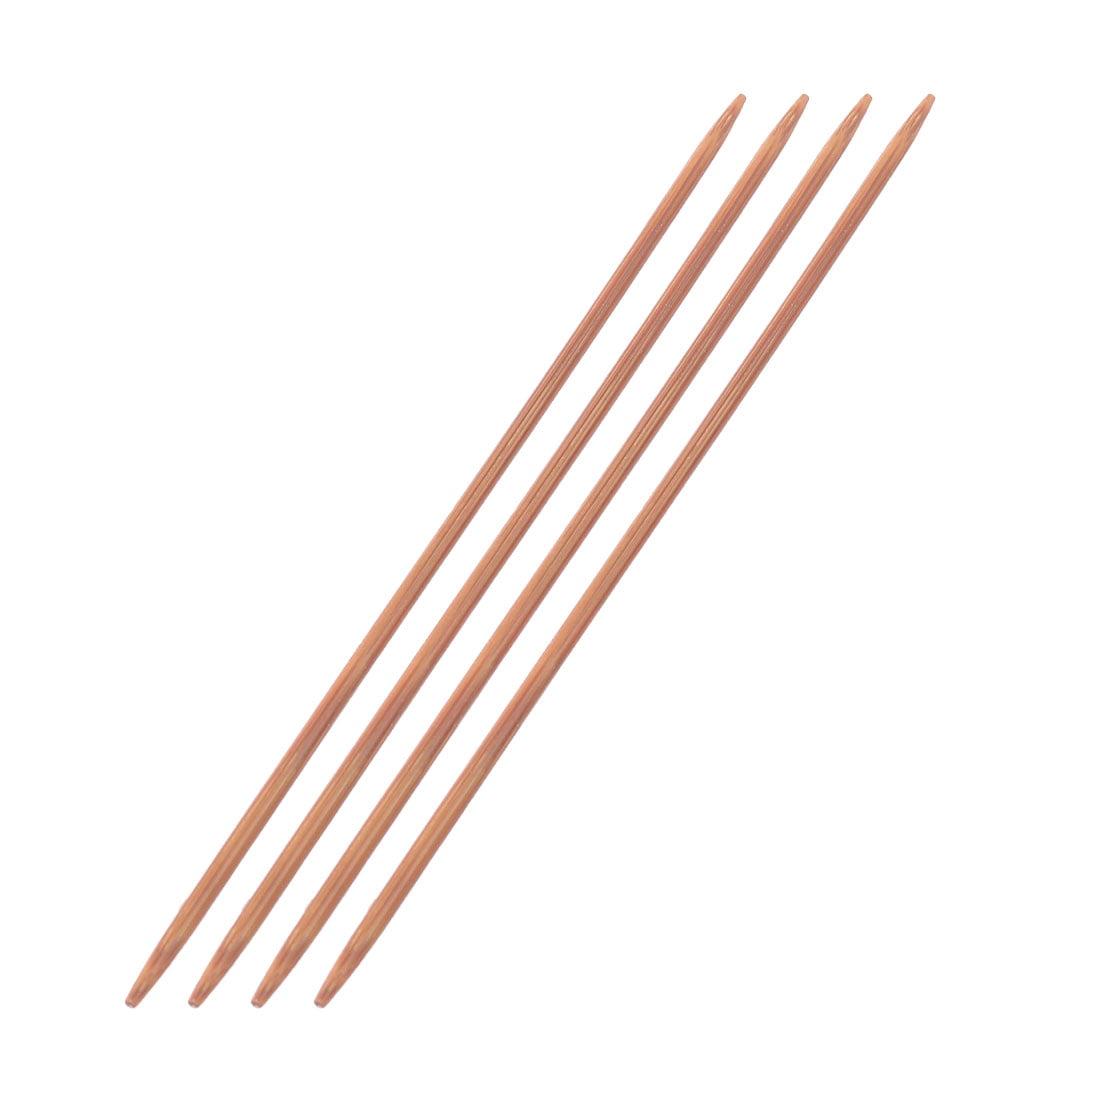 Bamboo Sewing Knitting Tatting Hat Socks Golves Needles Brown 2.5mm Dia 4pcs